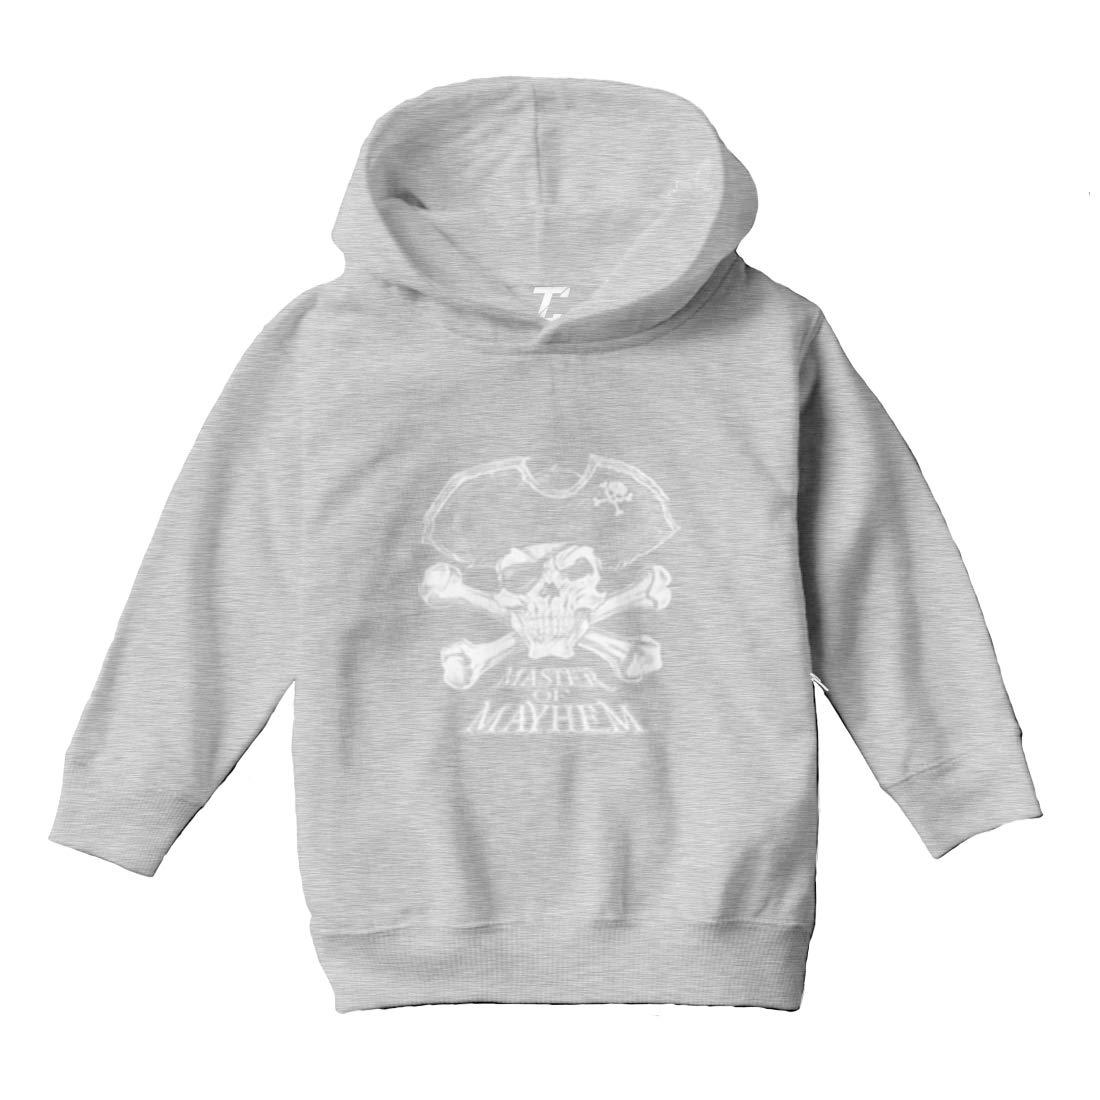 Pirate Skull Toddler//Youth Fleece Hoodie Tcombo Master of Mayhem